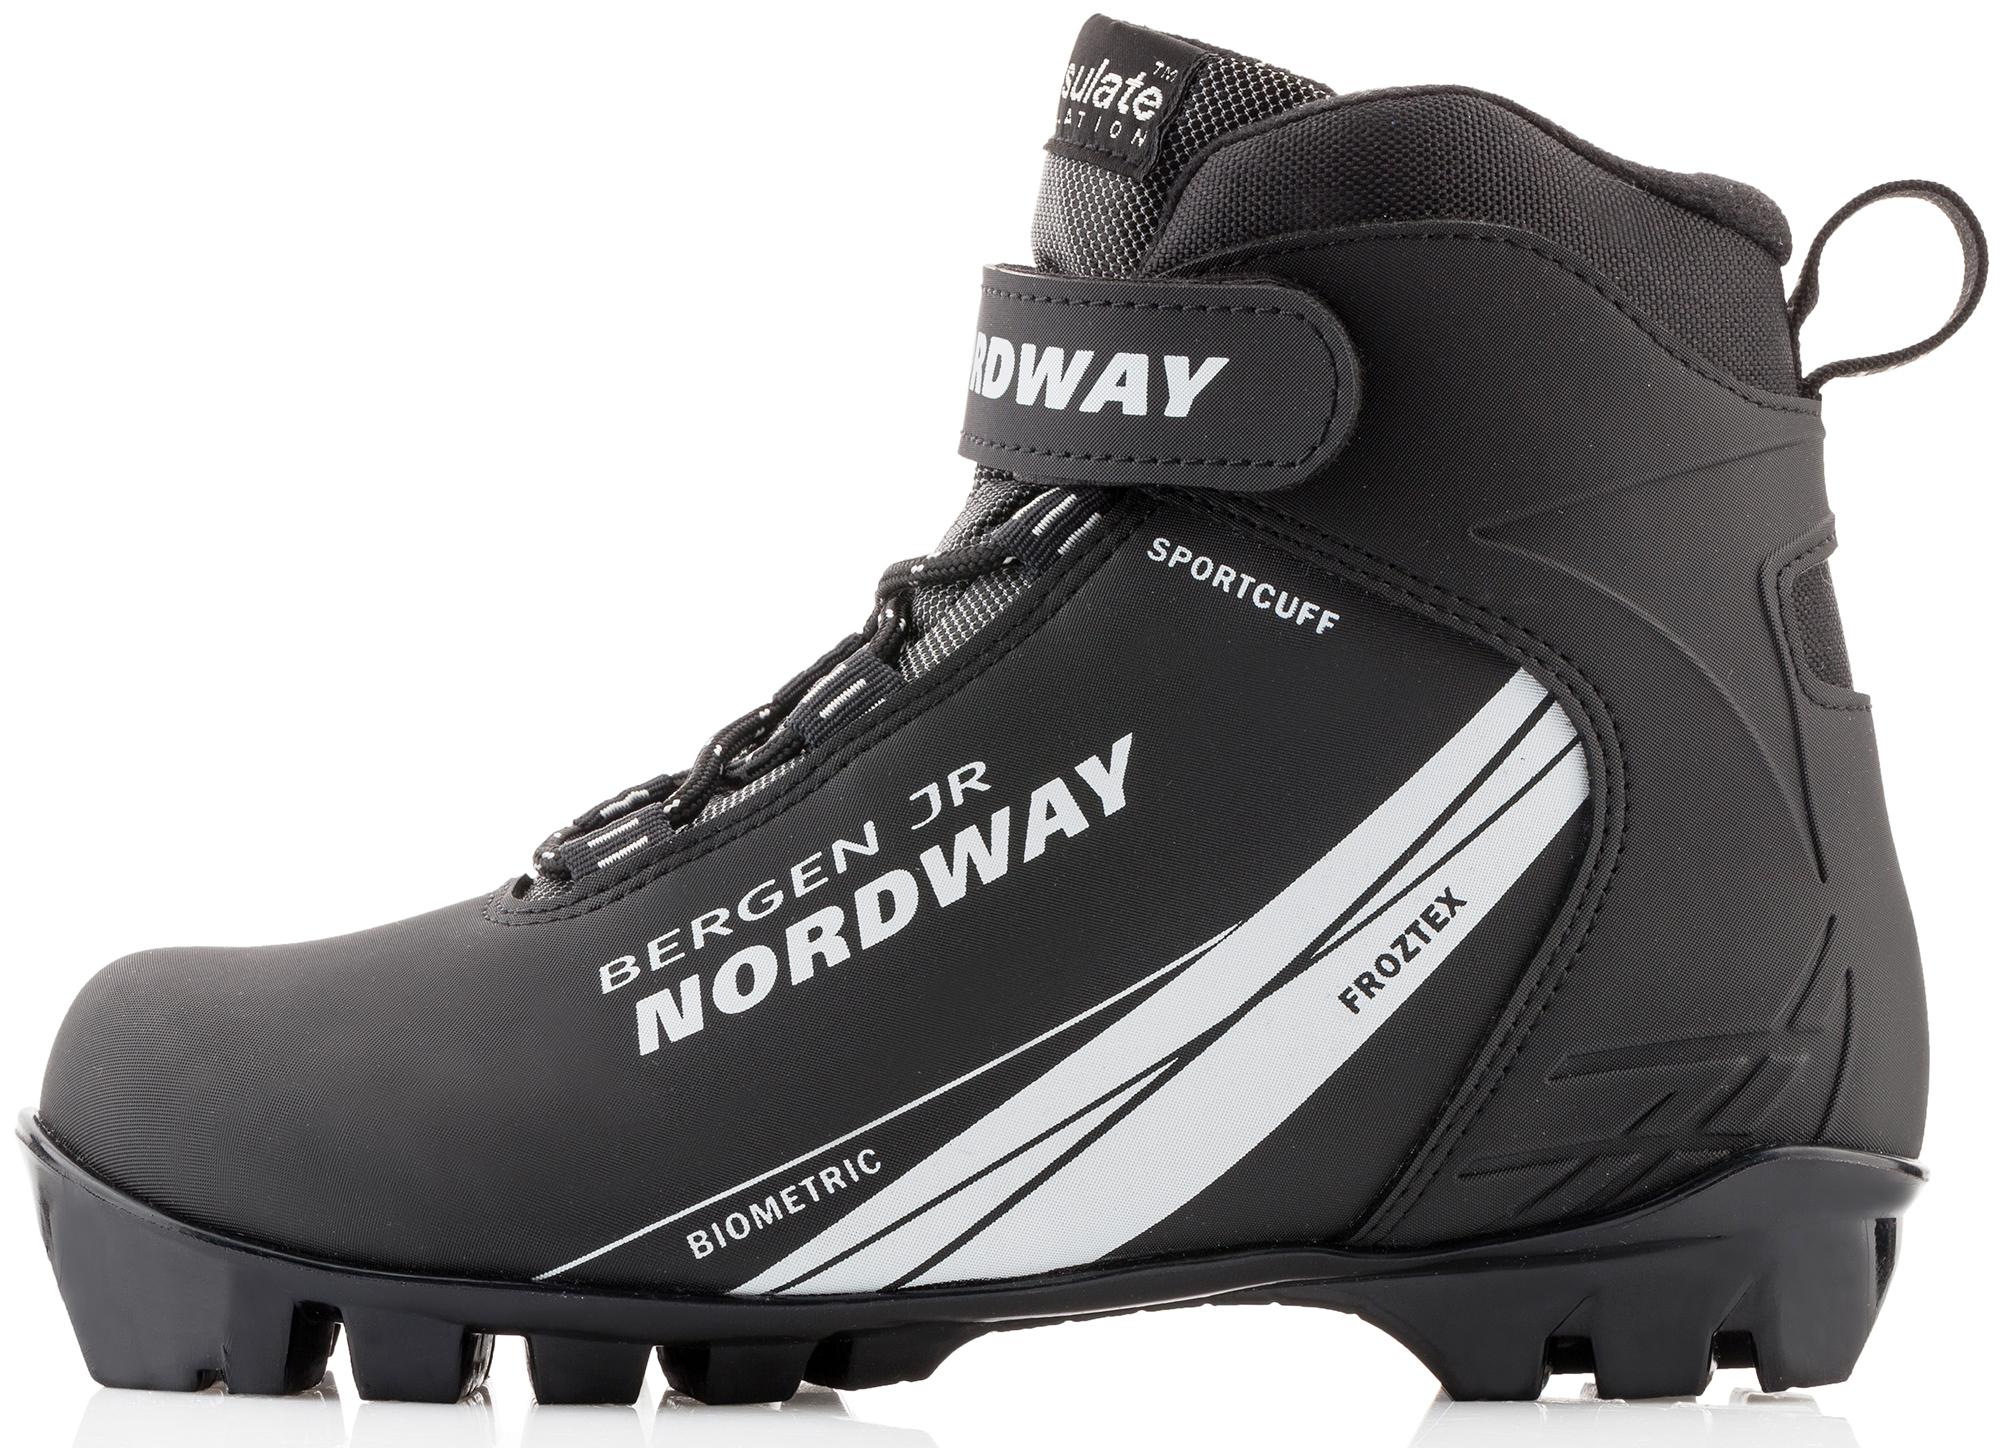 Nordway Ботинки для беговых лыж детские Nordway Bergen nordway крепления для лыж nordway nn 75